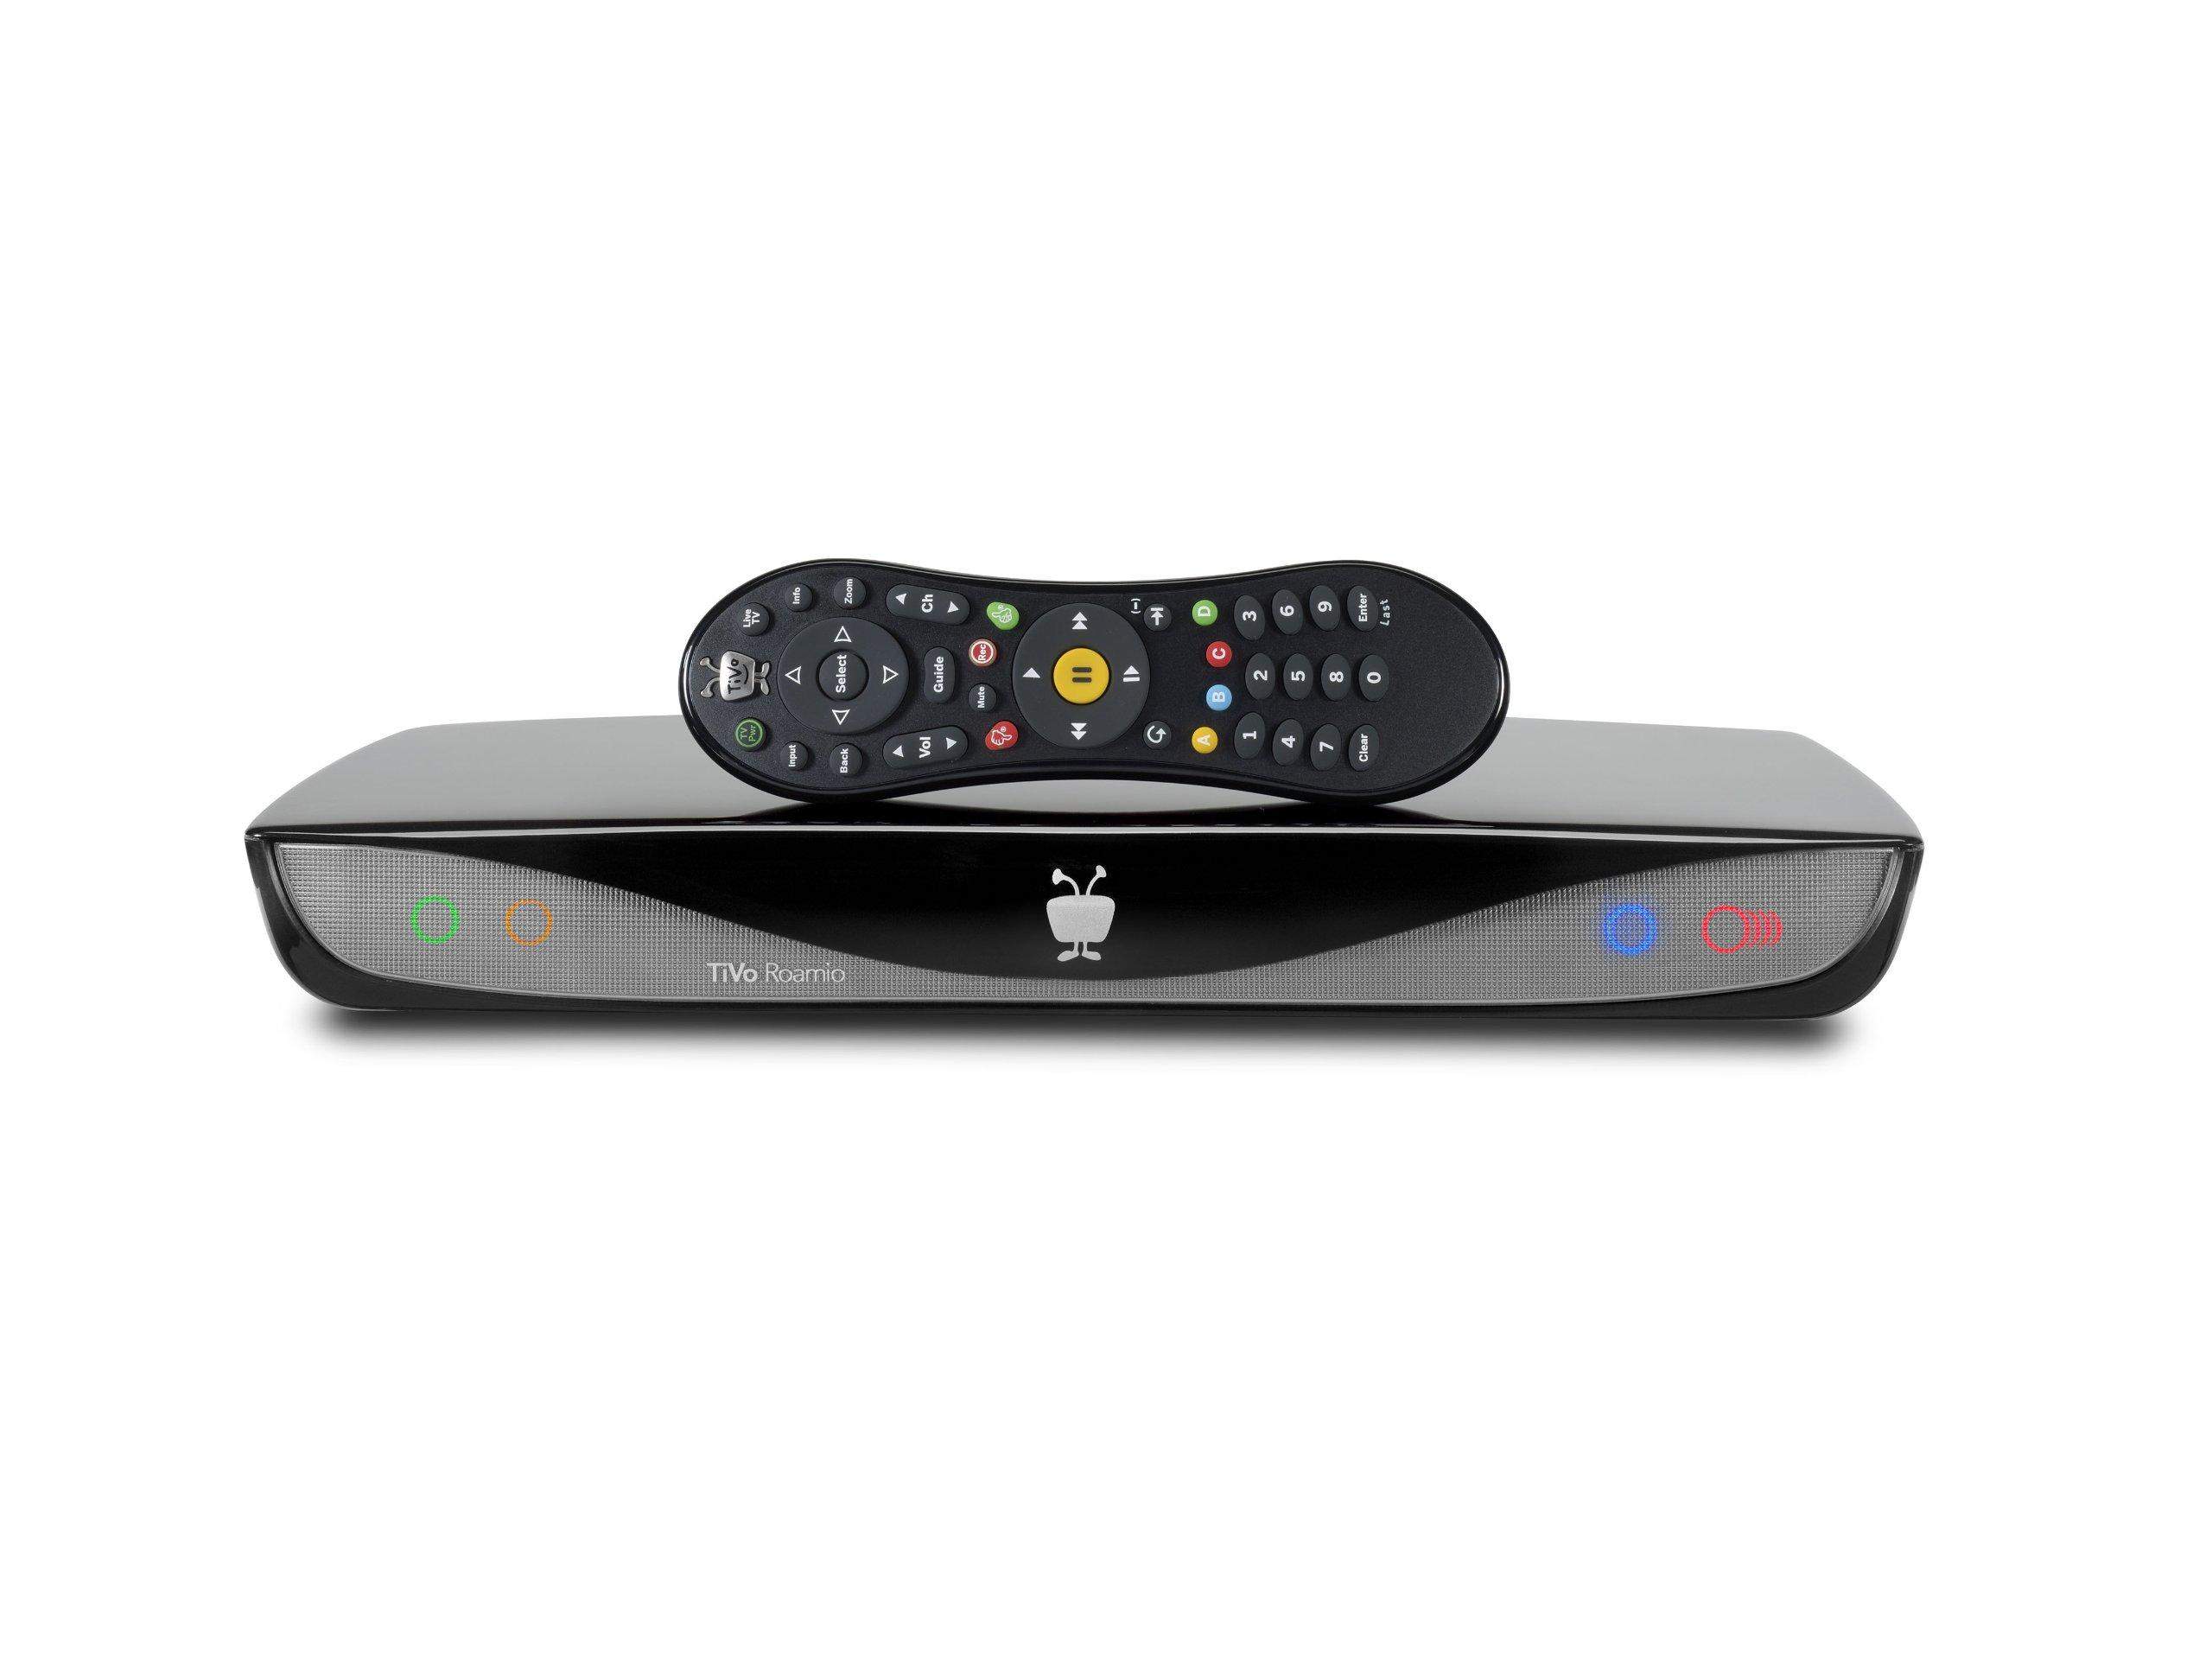 Digital Video Recorder And Streaming Media TiVo BOLT 500 GB DVR